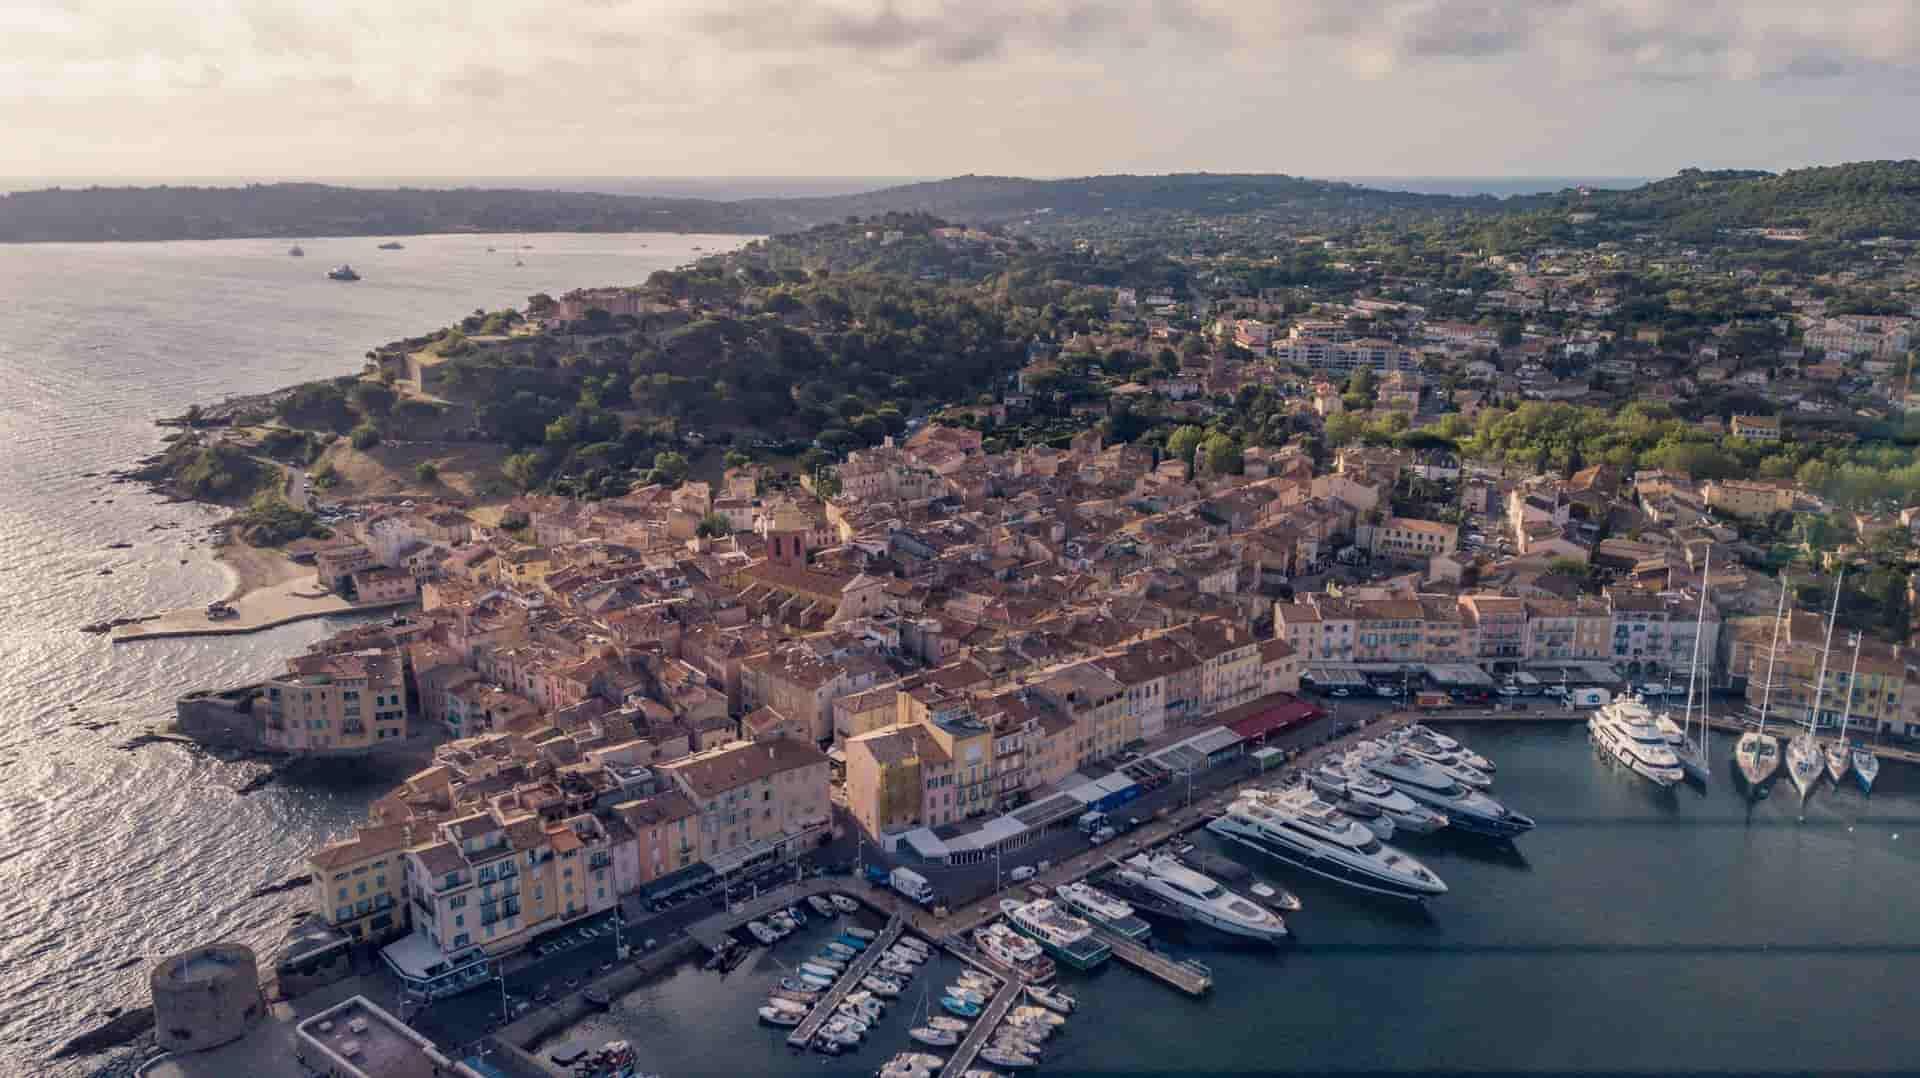 Boat Rentals in Saint Tropez